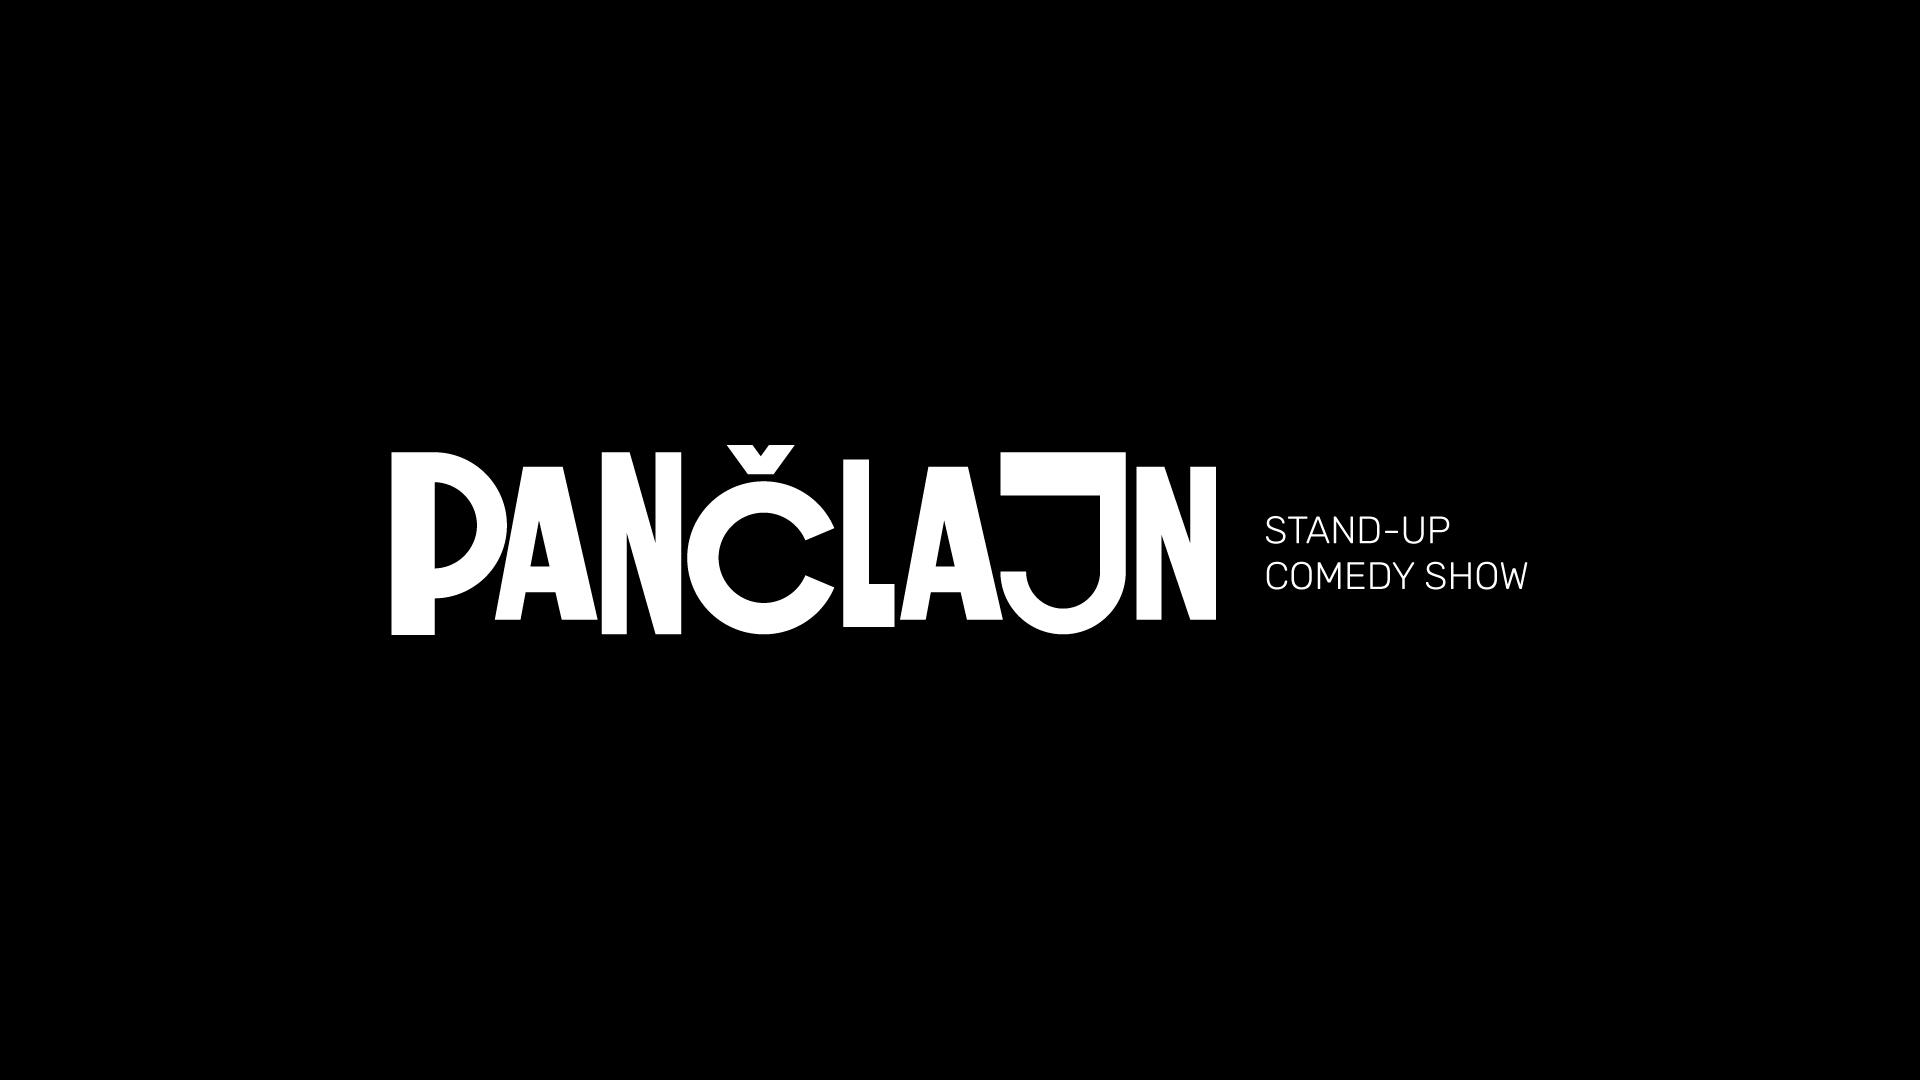 Pančlajn Stand-up Comedy Show